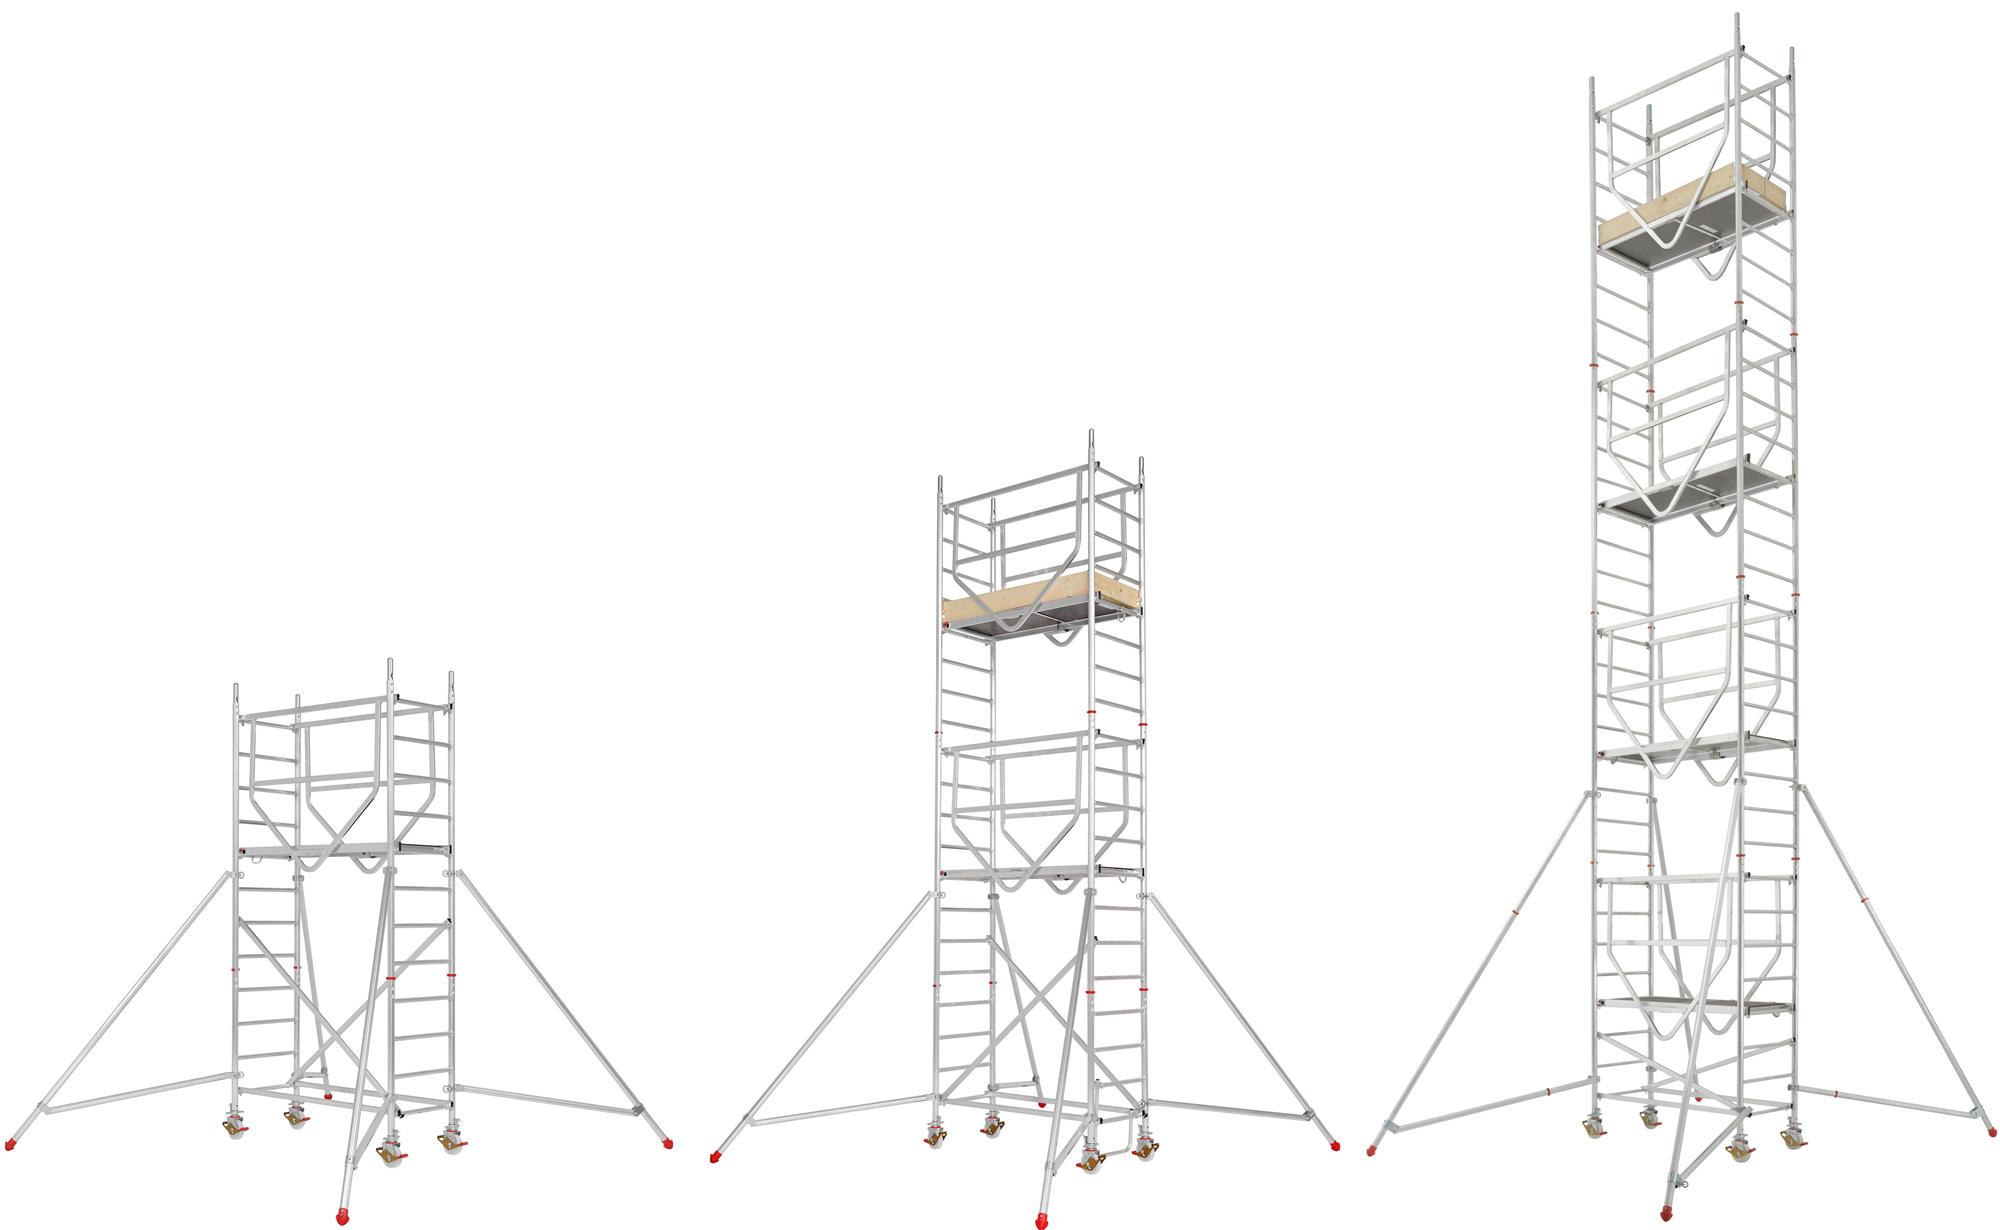 Hymer Fahrgerüst ADVANCED SAFE-T 0,72 x 1,58 m